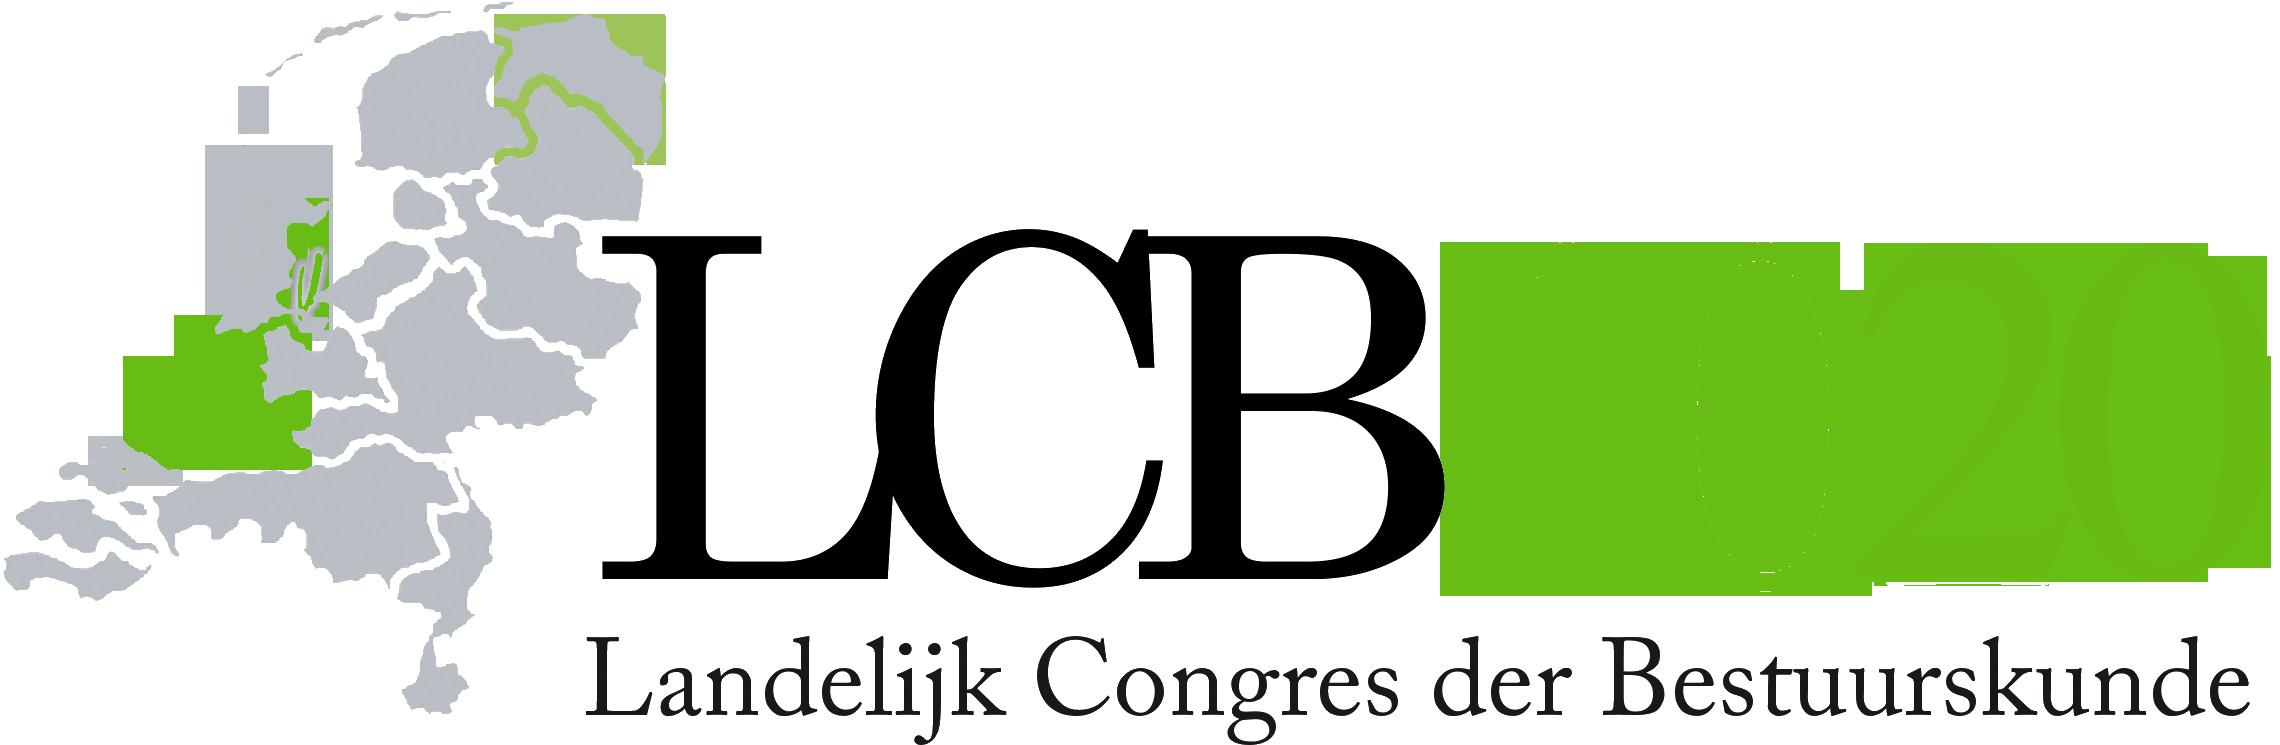 Landelijk Congres der Bestuurskunde (LCB) 2020